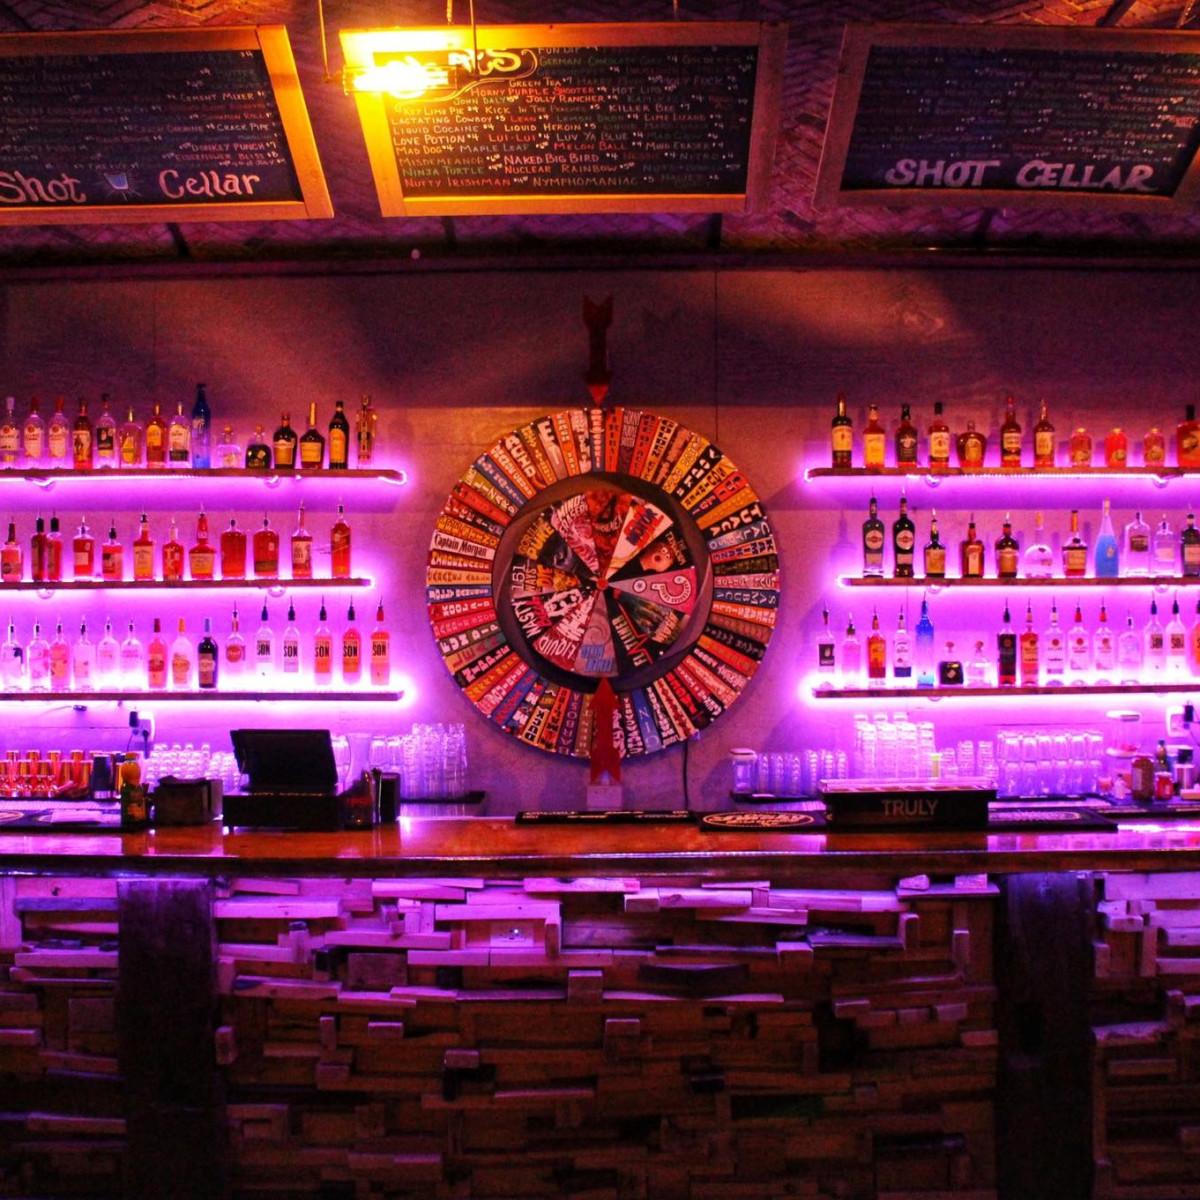 The Shot Cellar